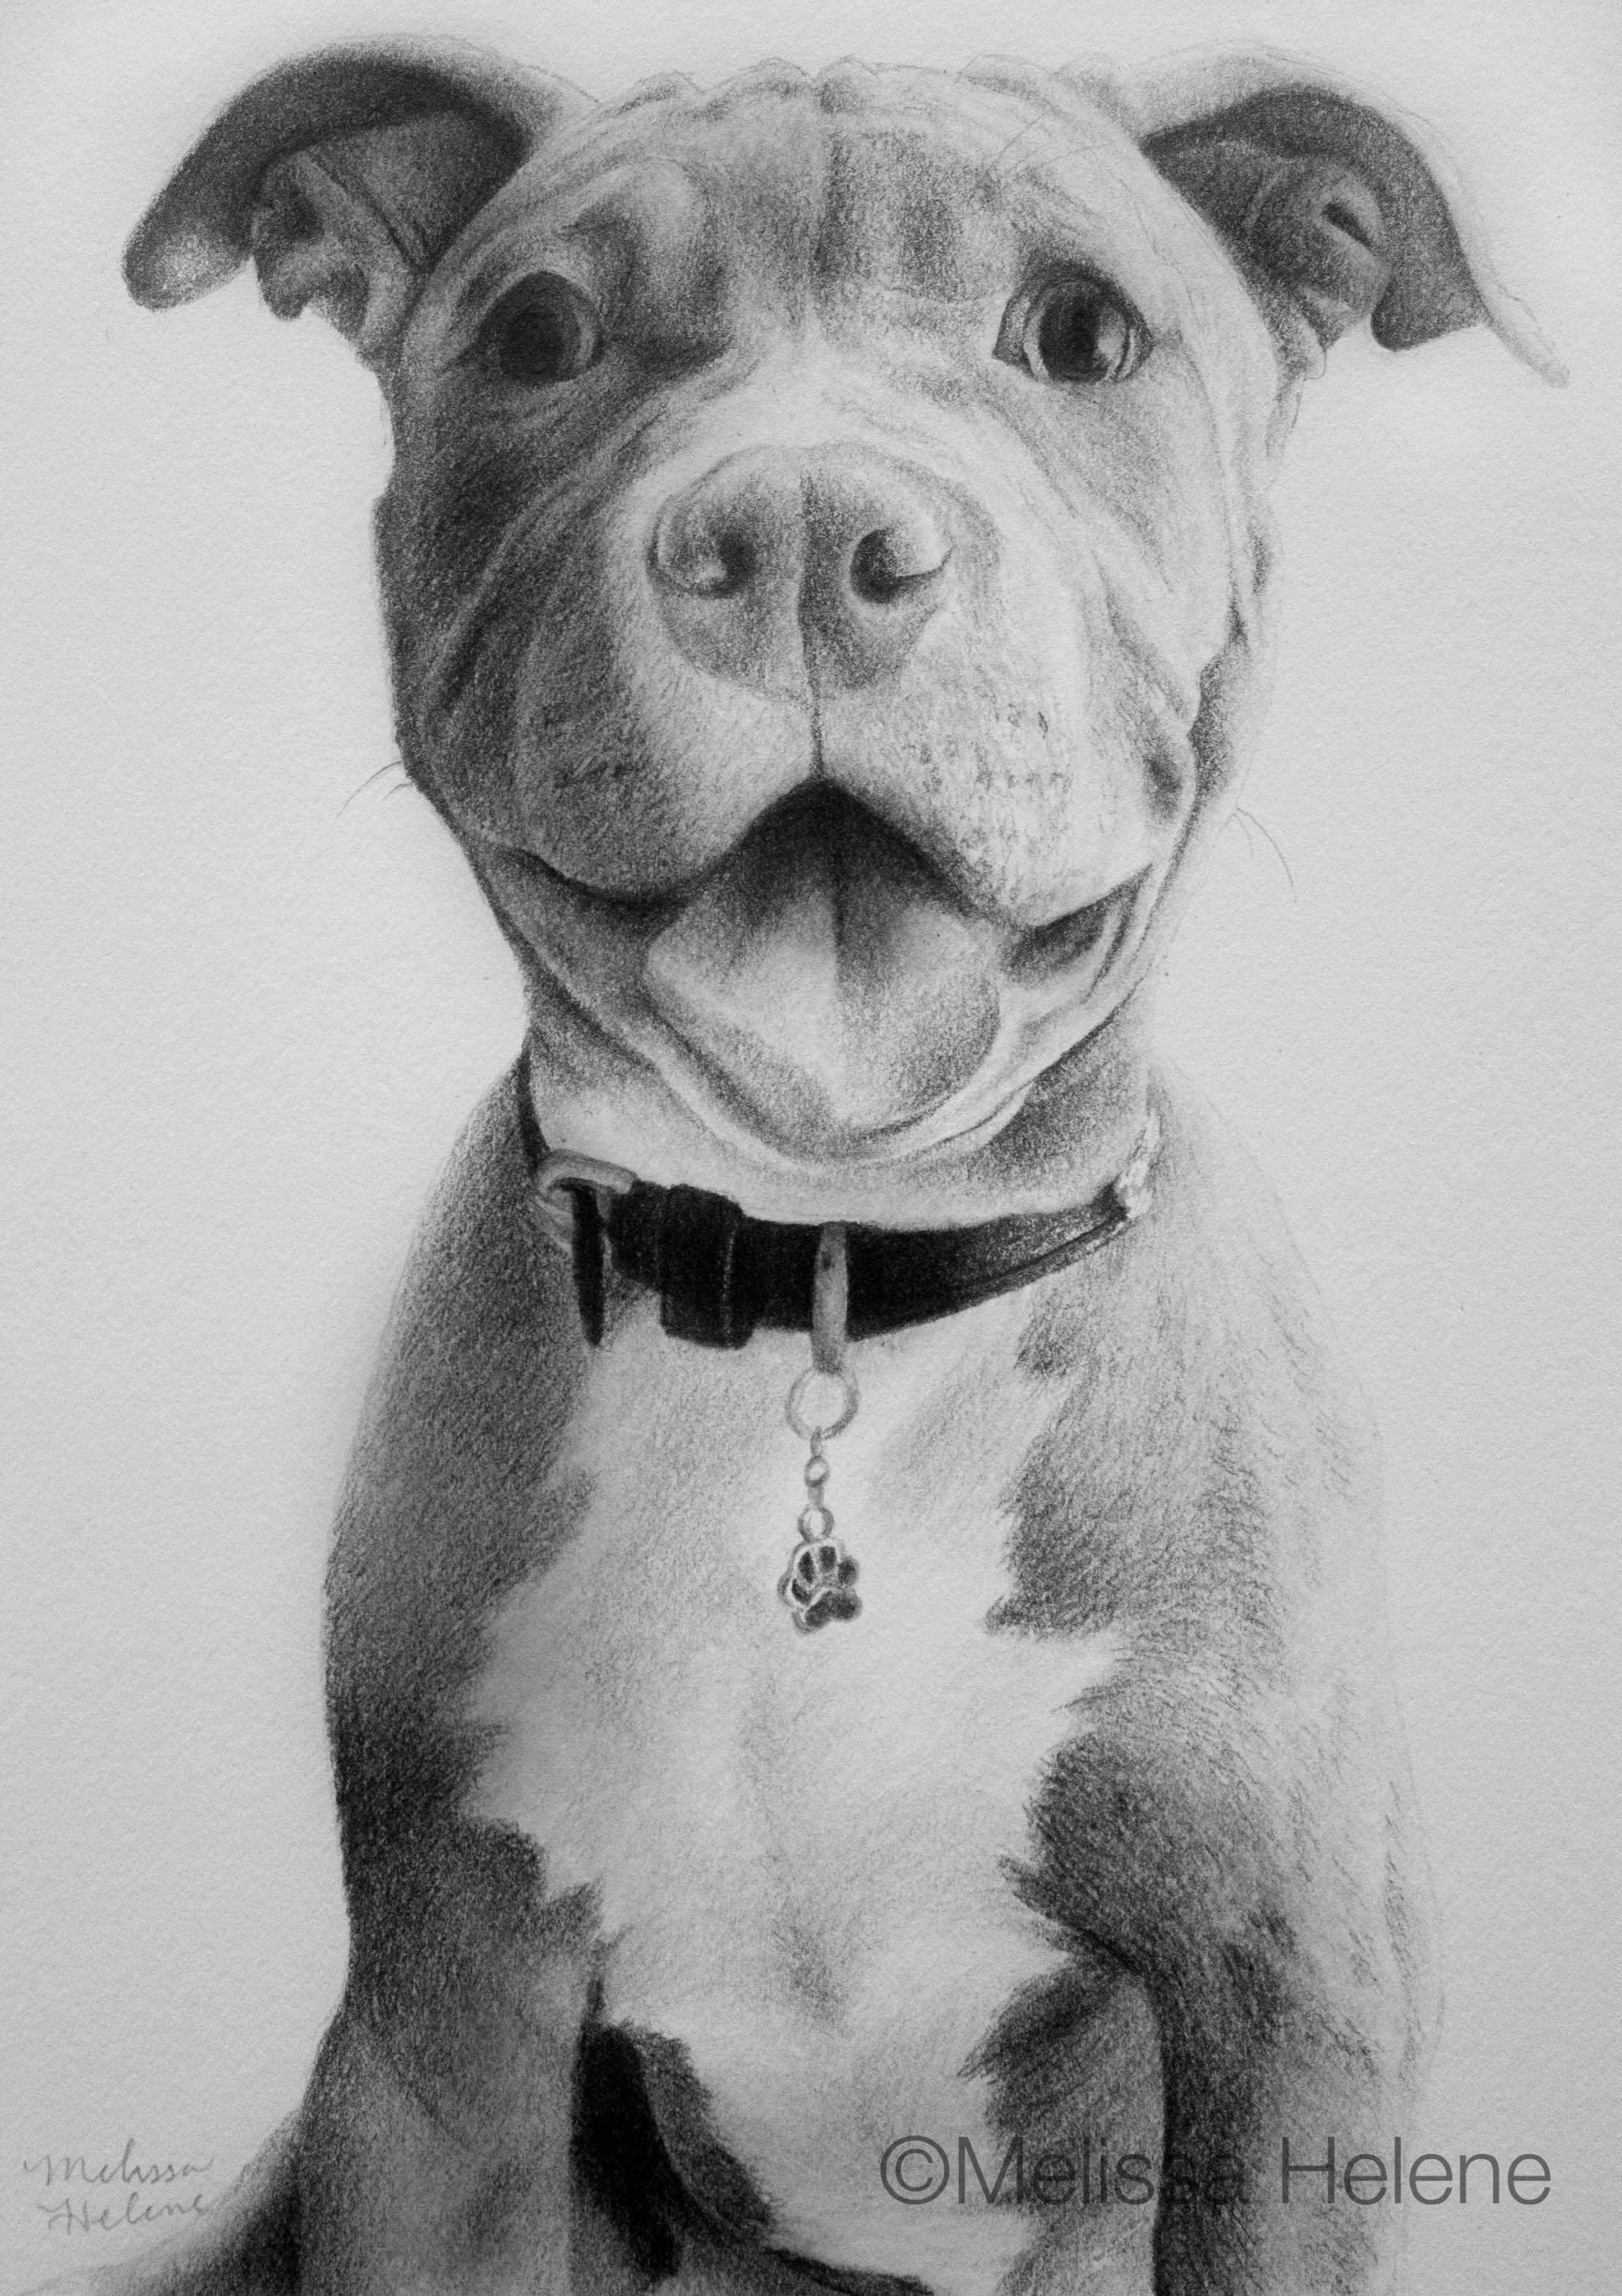 Pitbull Puppy Melissa Helene 5x7 Graphite Pet Portrait